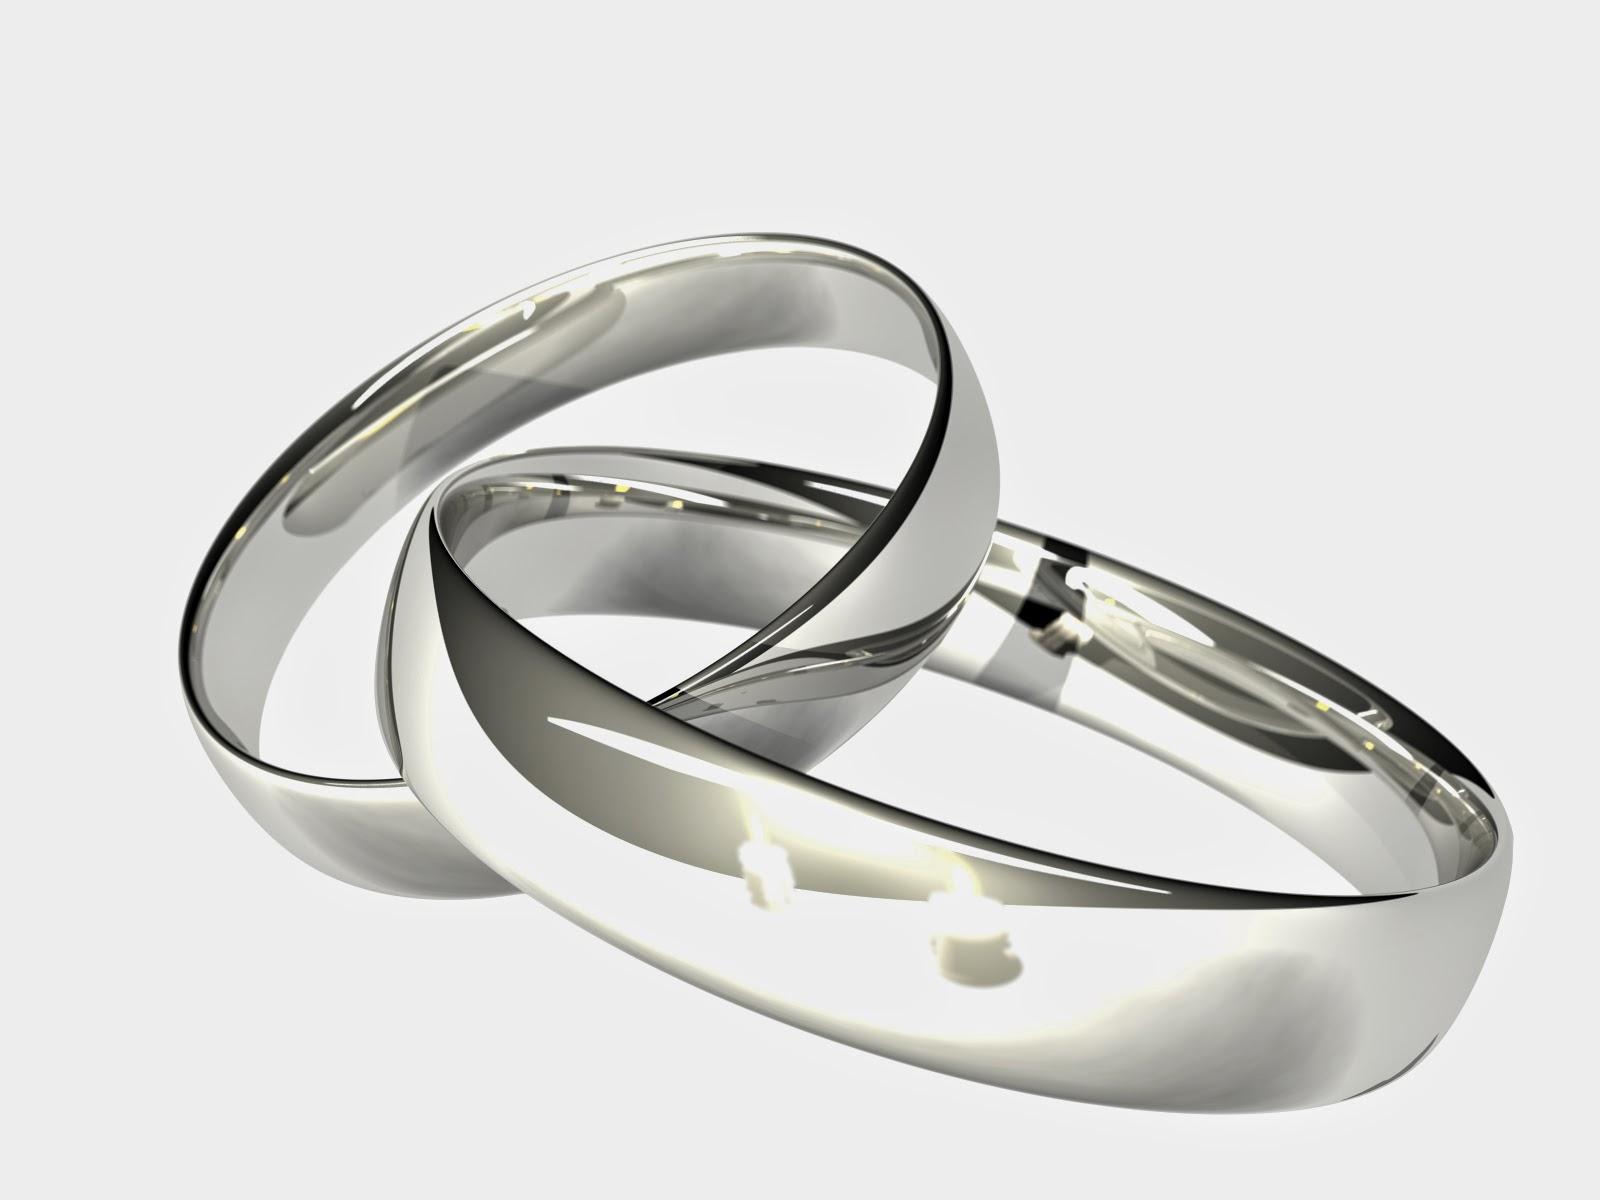 Cool Wedding Ring 2016 Wedding Ring Christian Symbolism